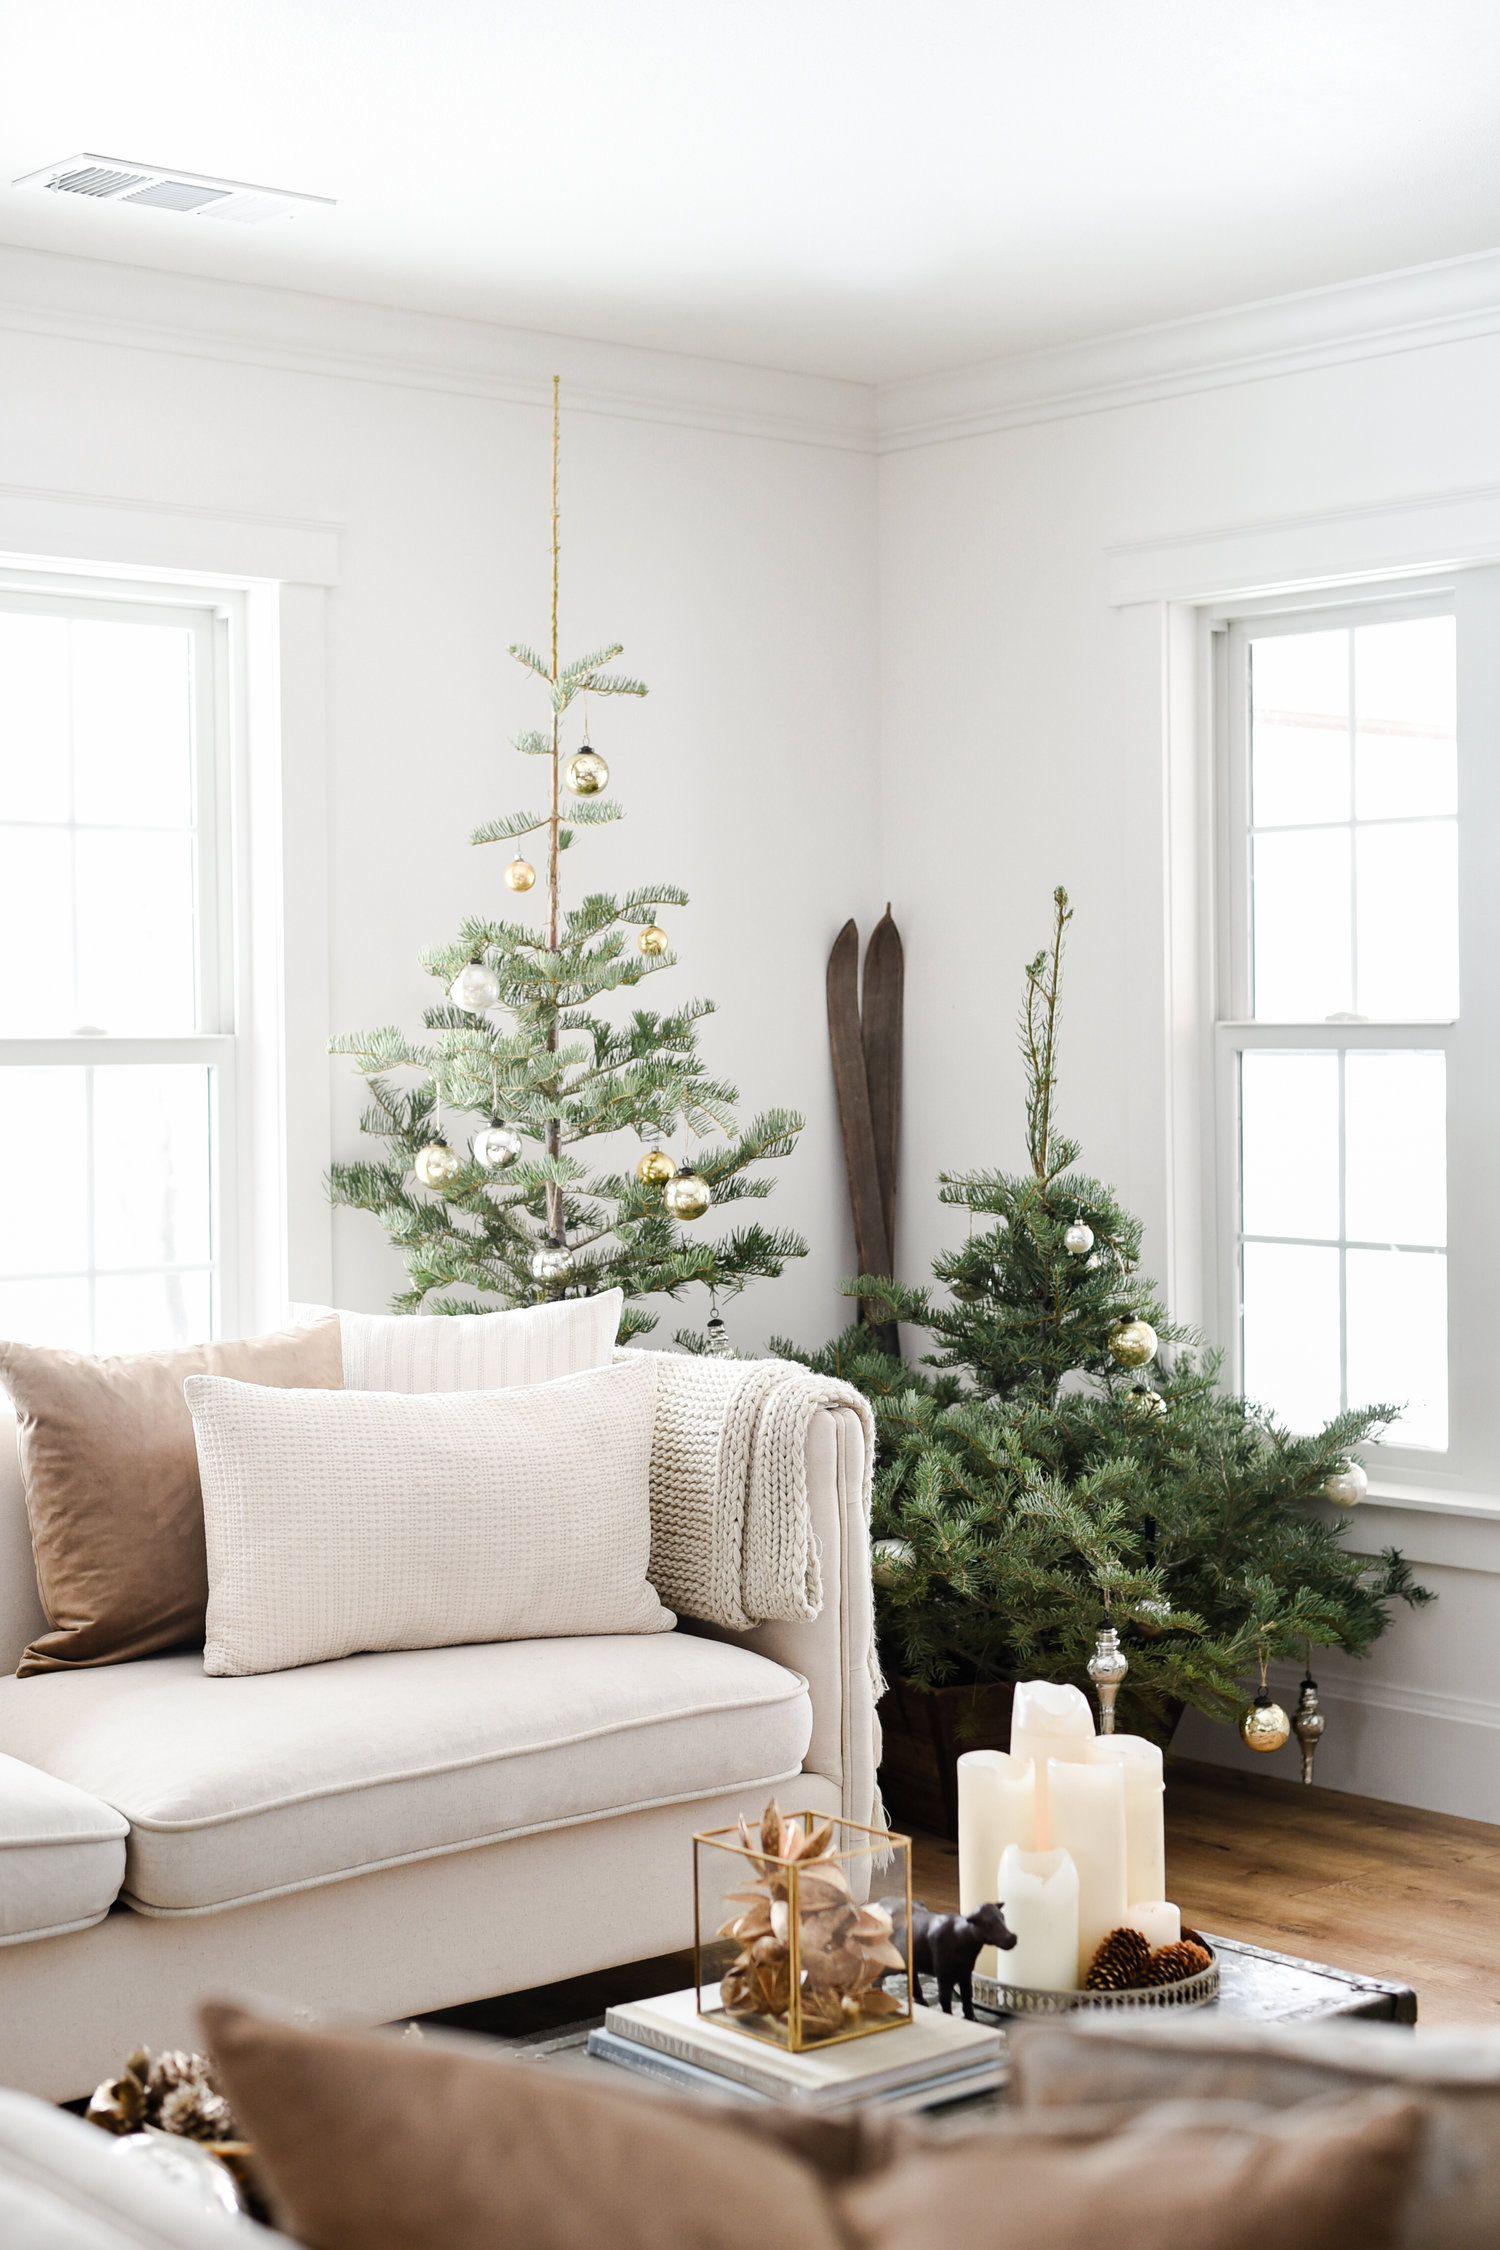 A Simple Farmhouse Christmas | Pinterest | Decorating, Holidays and ...